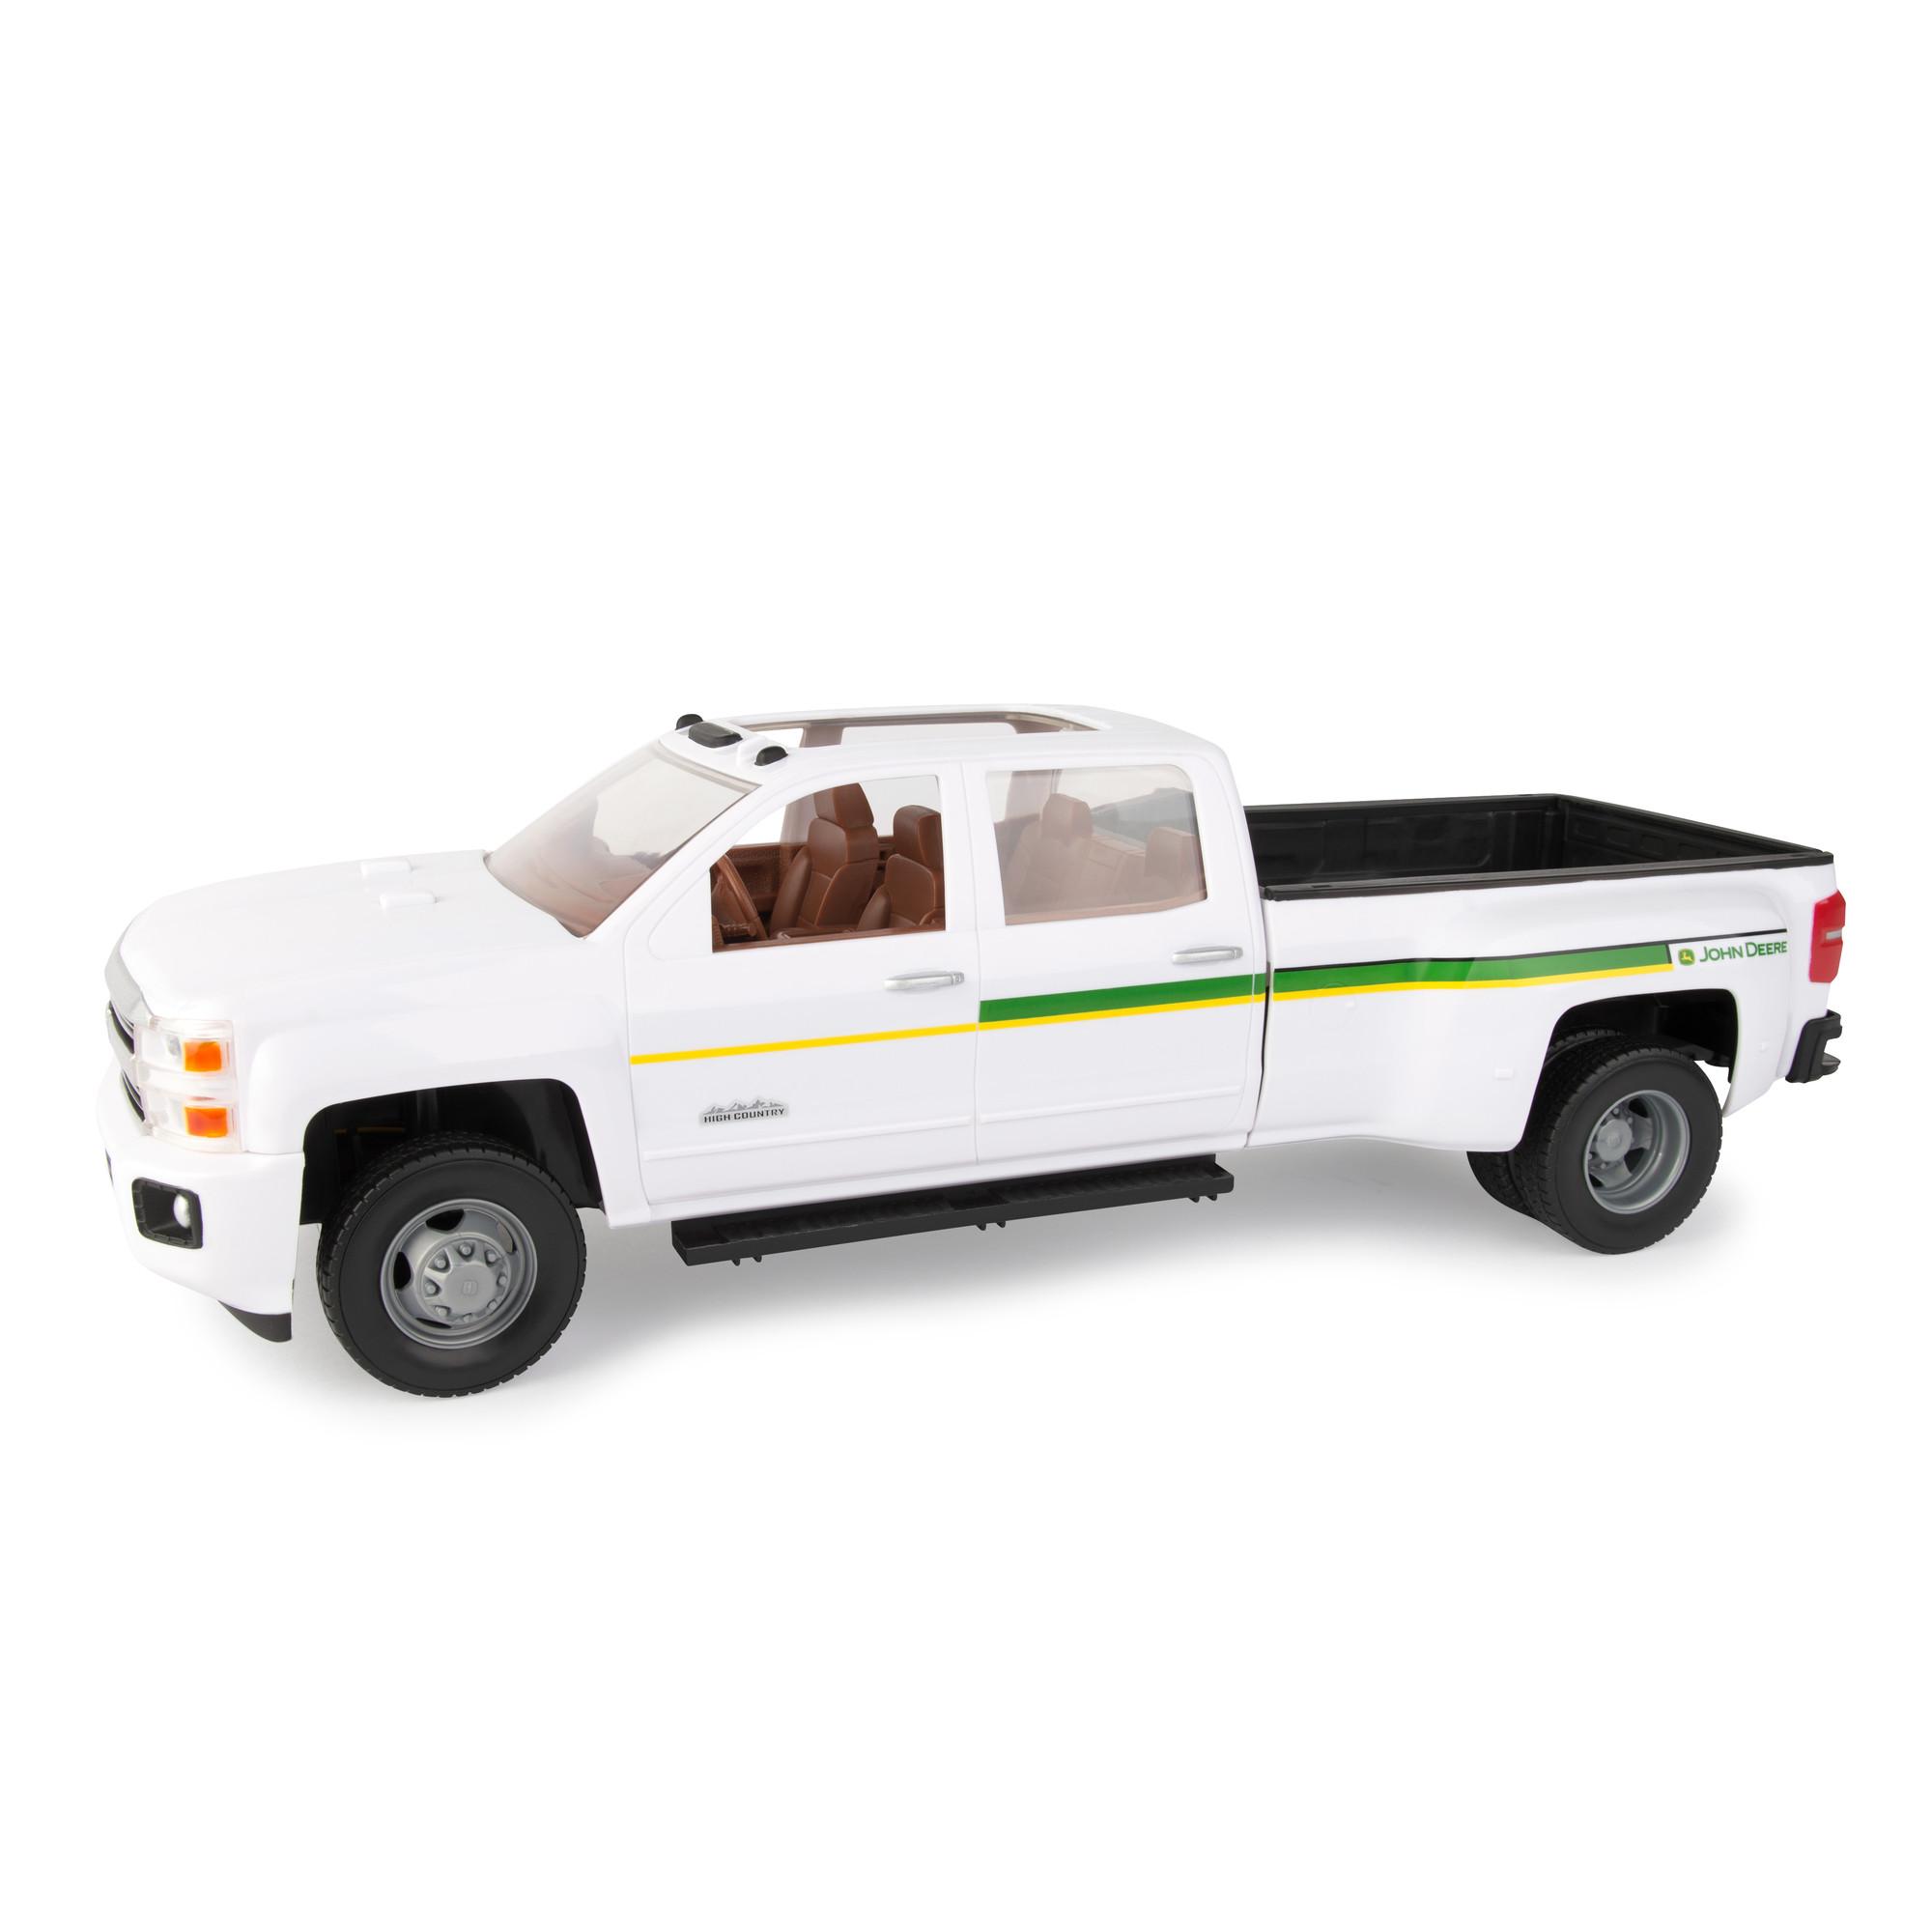 Big Farm 1:16 John Deere Chevrolet 3500 Dealership Truck by TOMY